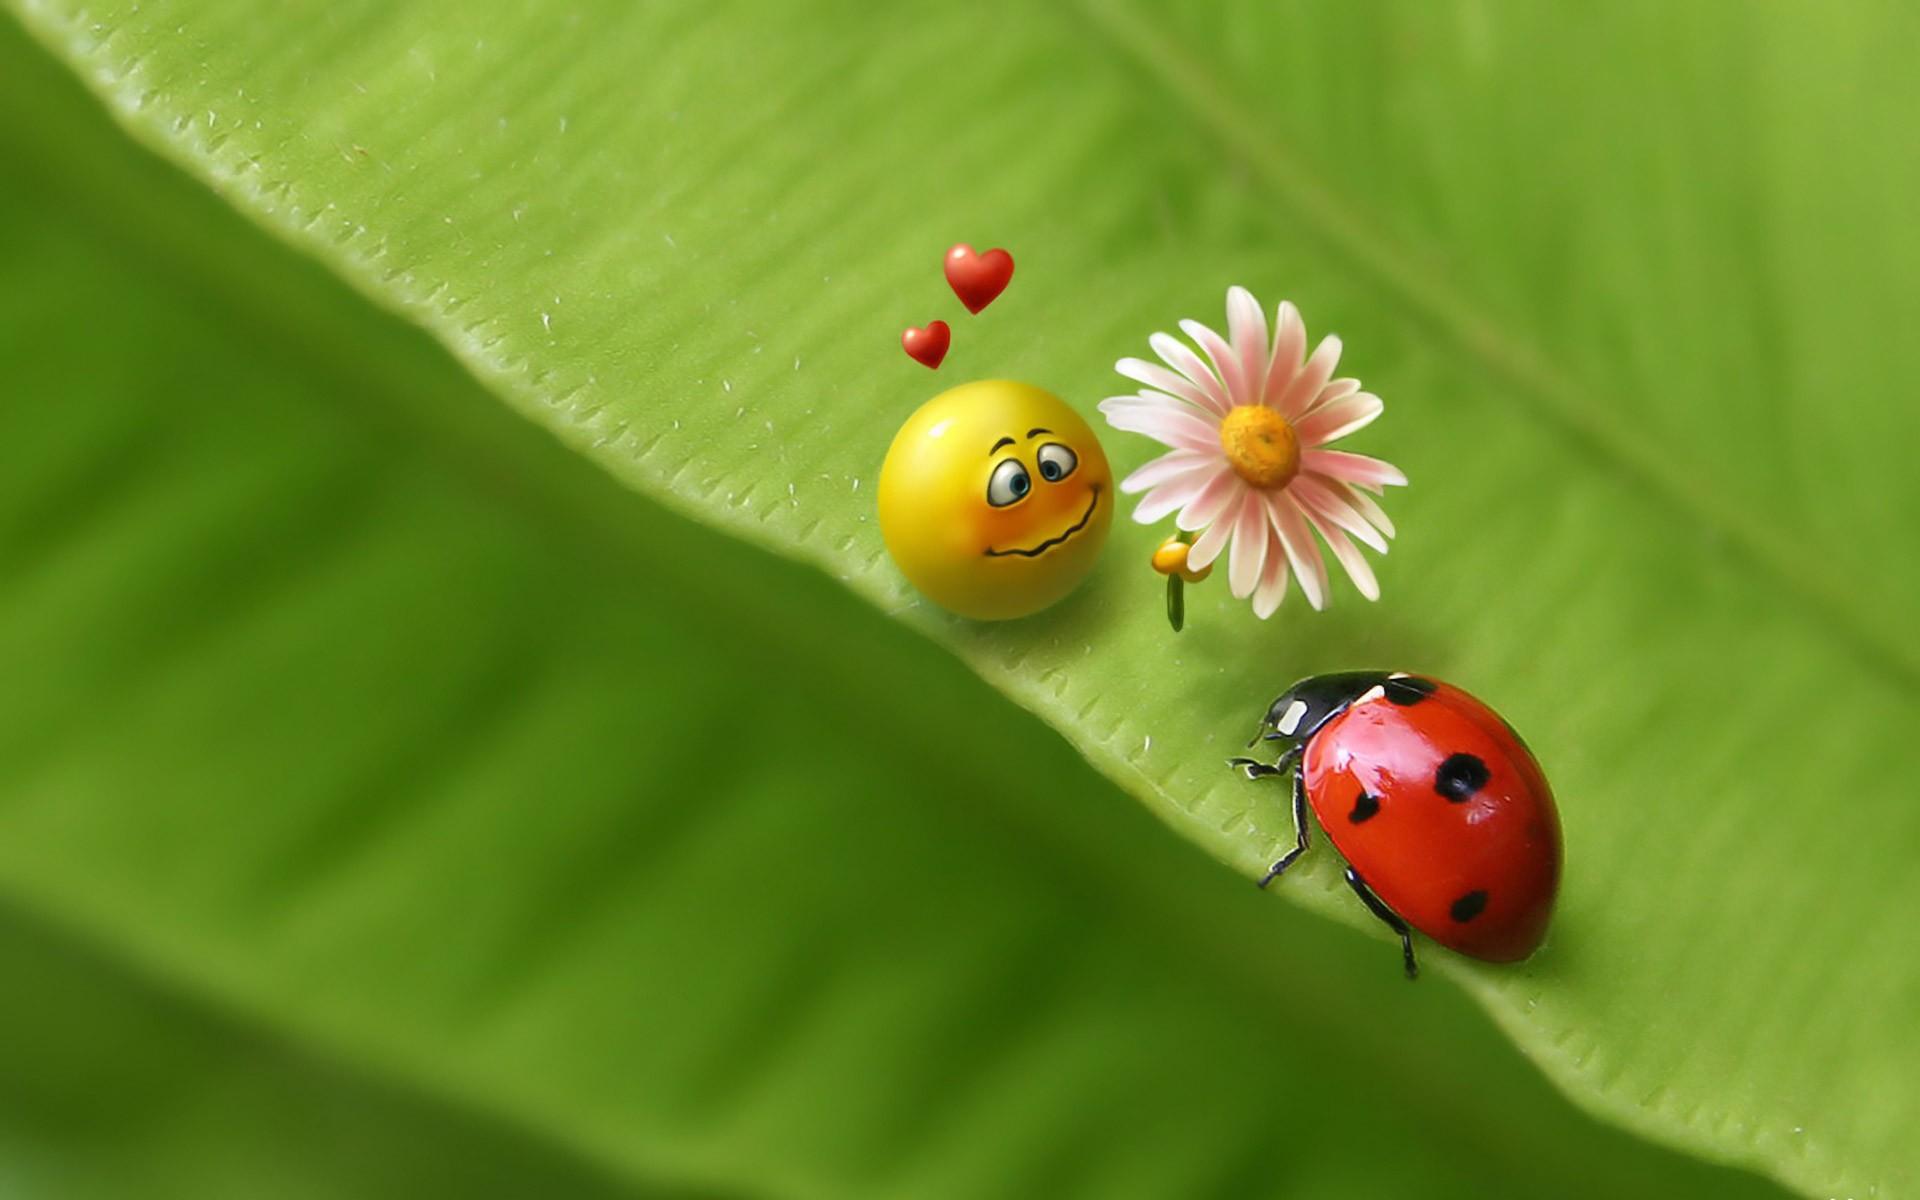 Humor - Ladybug Wallpaper